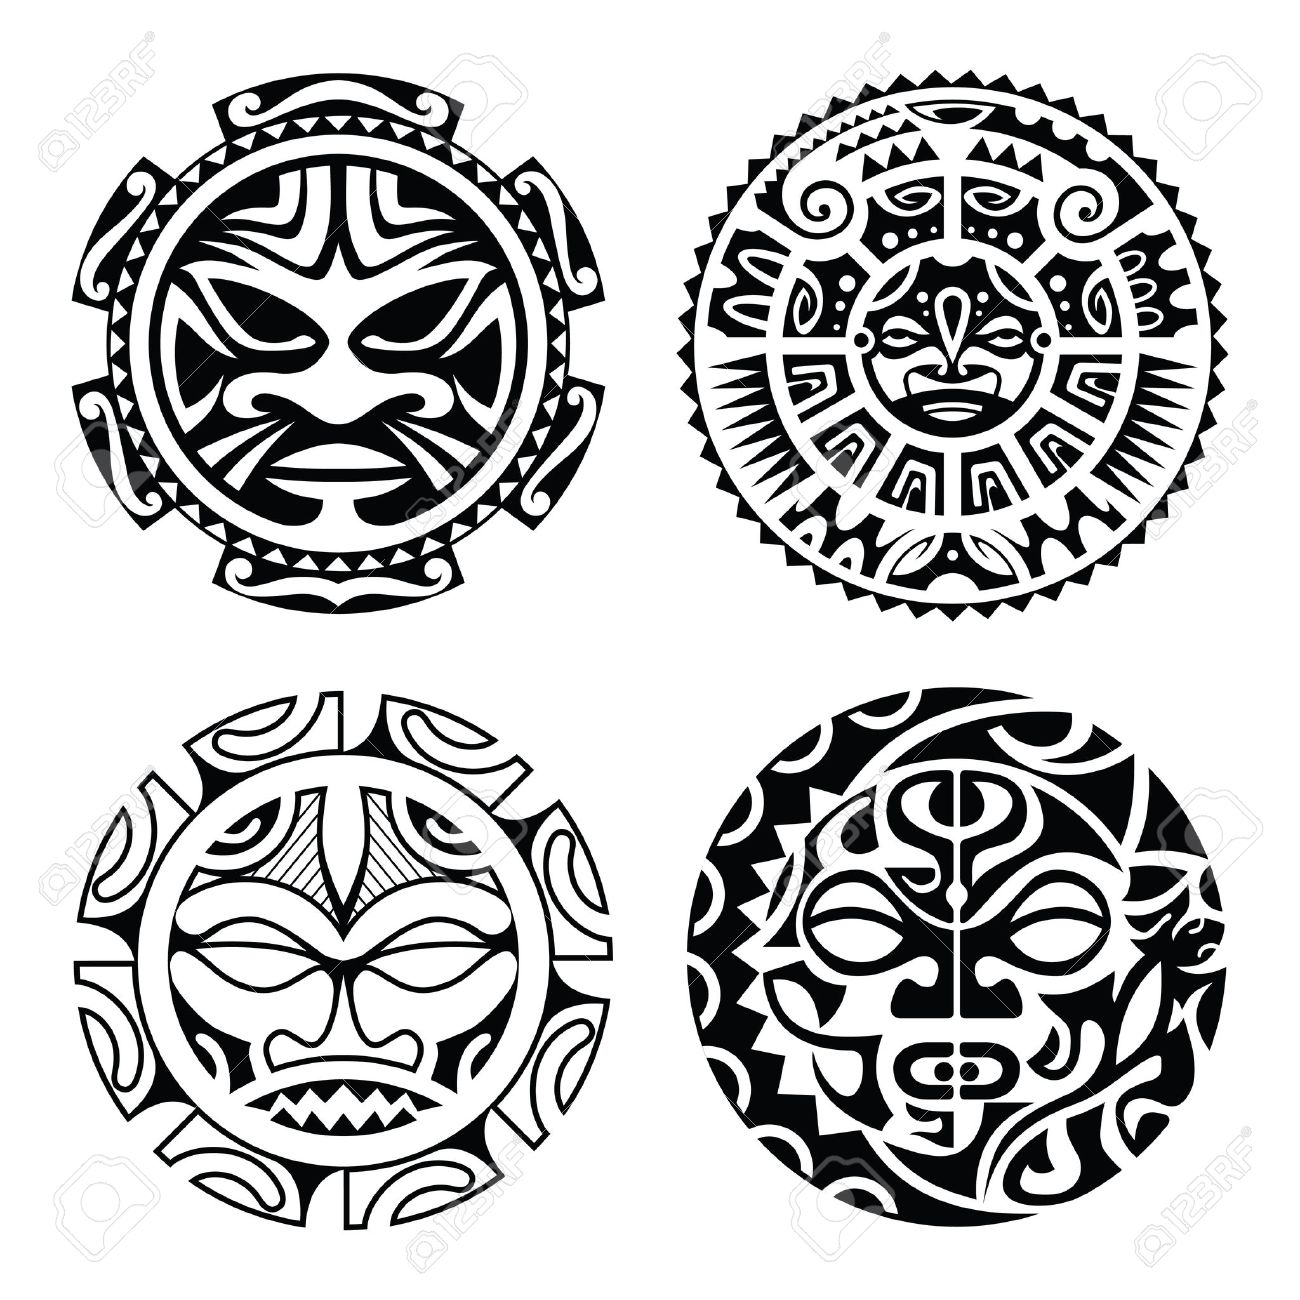 Significado Tatuajes Maories De Los Tatuajes Maor Las Mejores - Dibujos-maoris